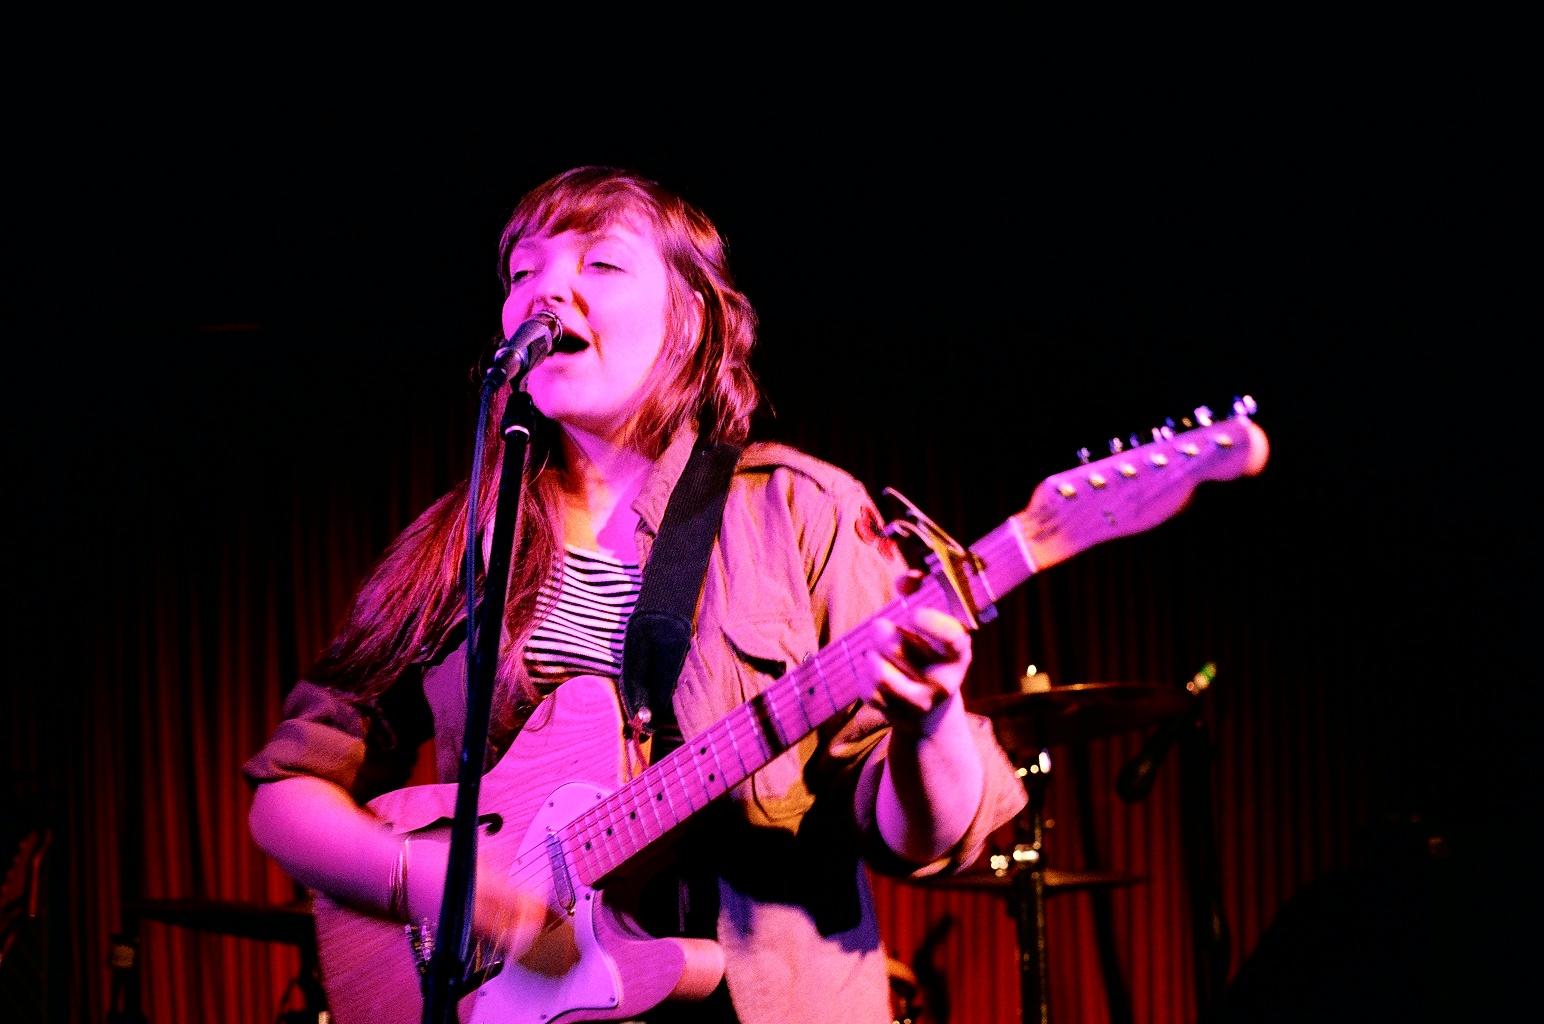 Chrisy Hurn of Basement Revolver. Photo by Steph Dubik.